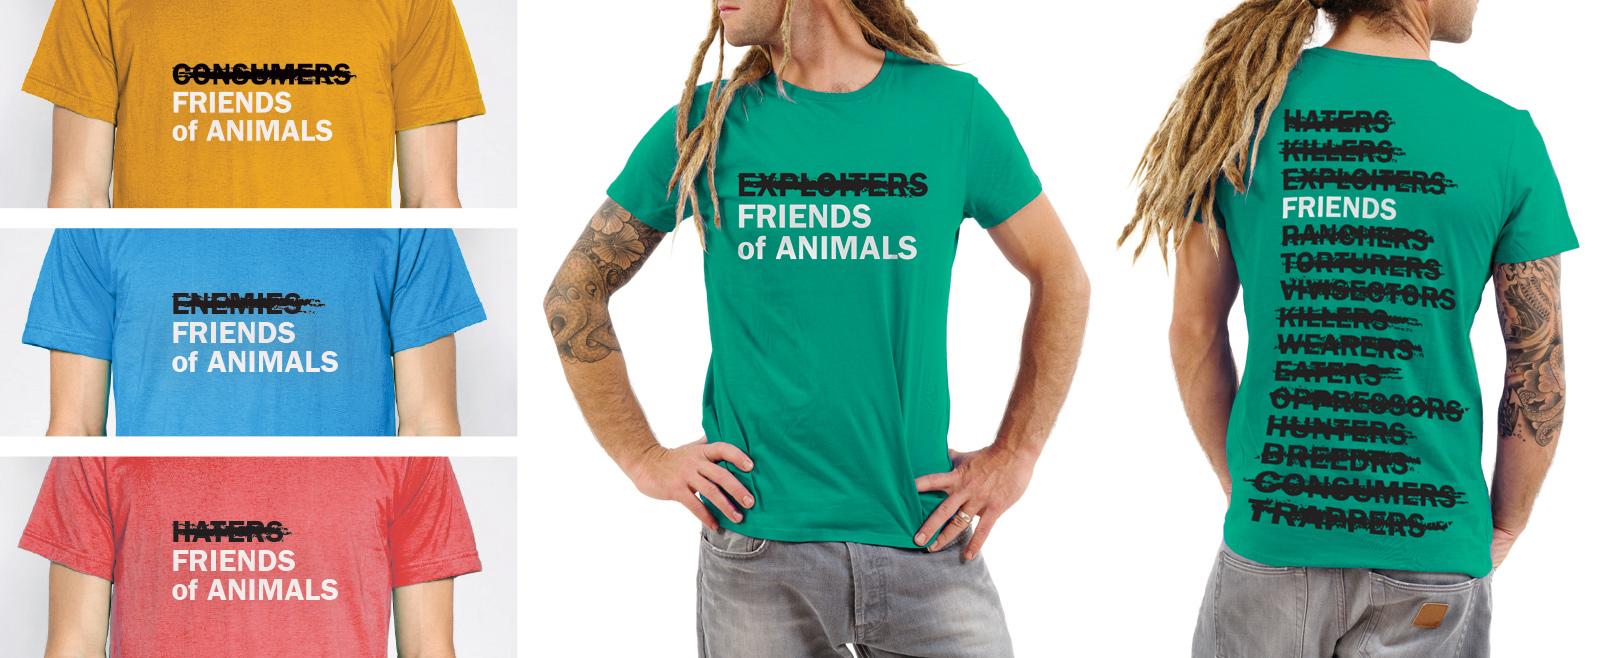 t-shirt-rendering